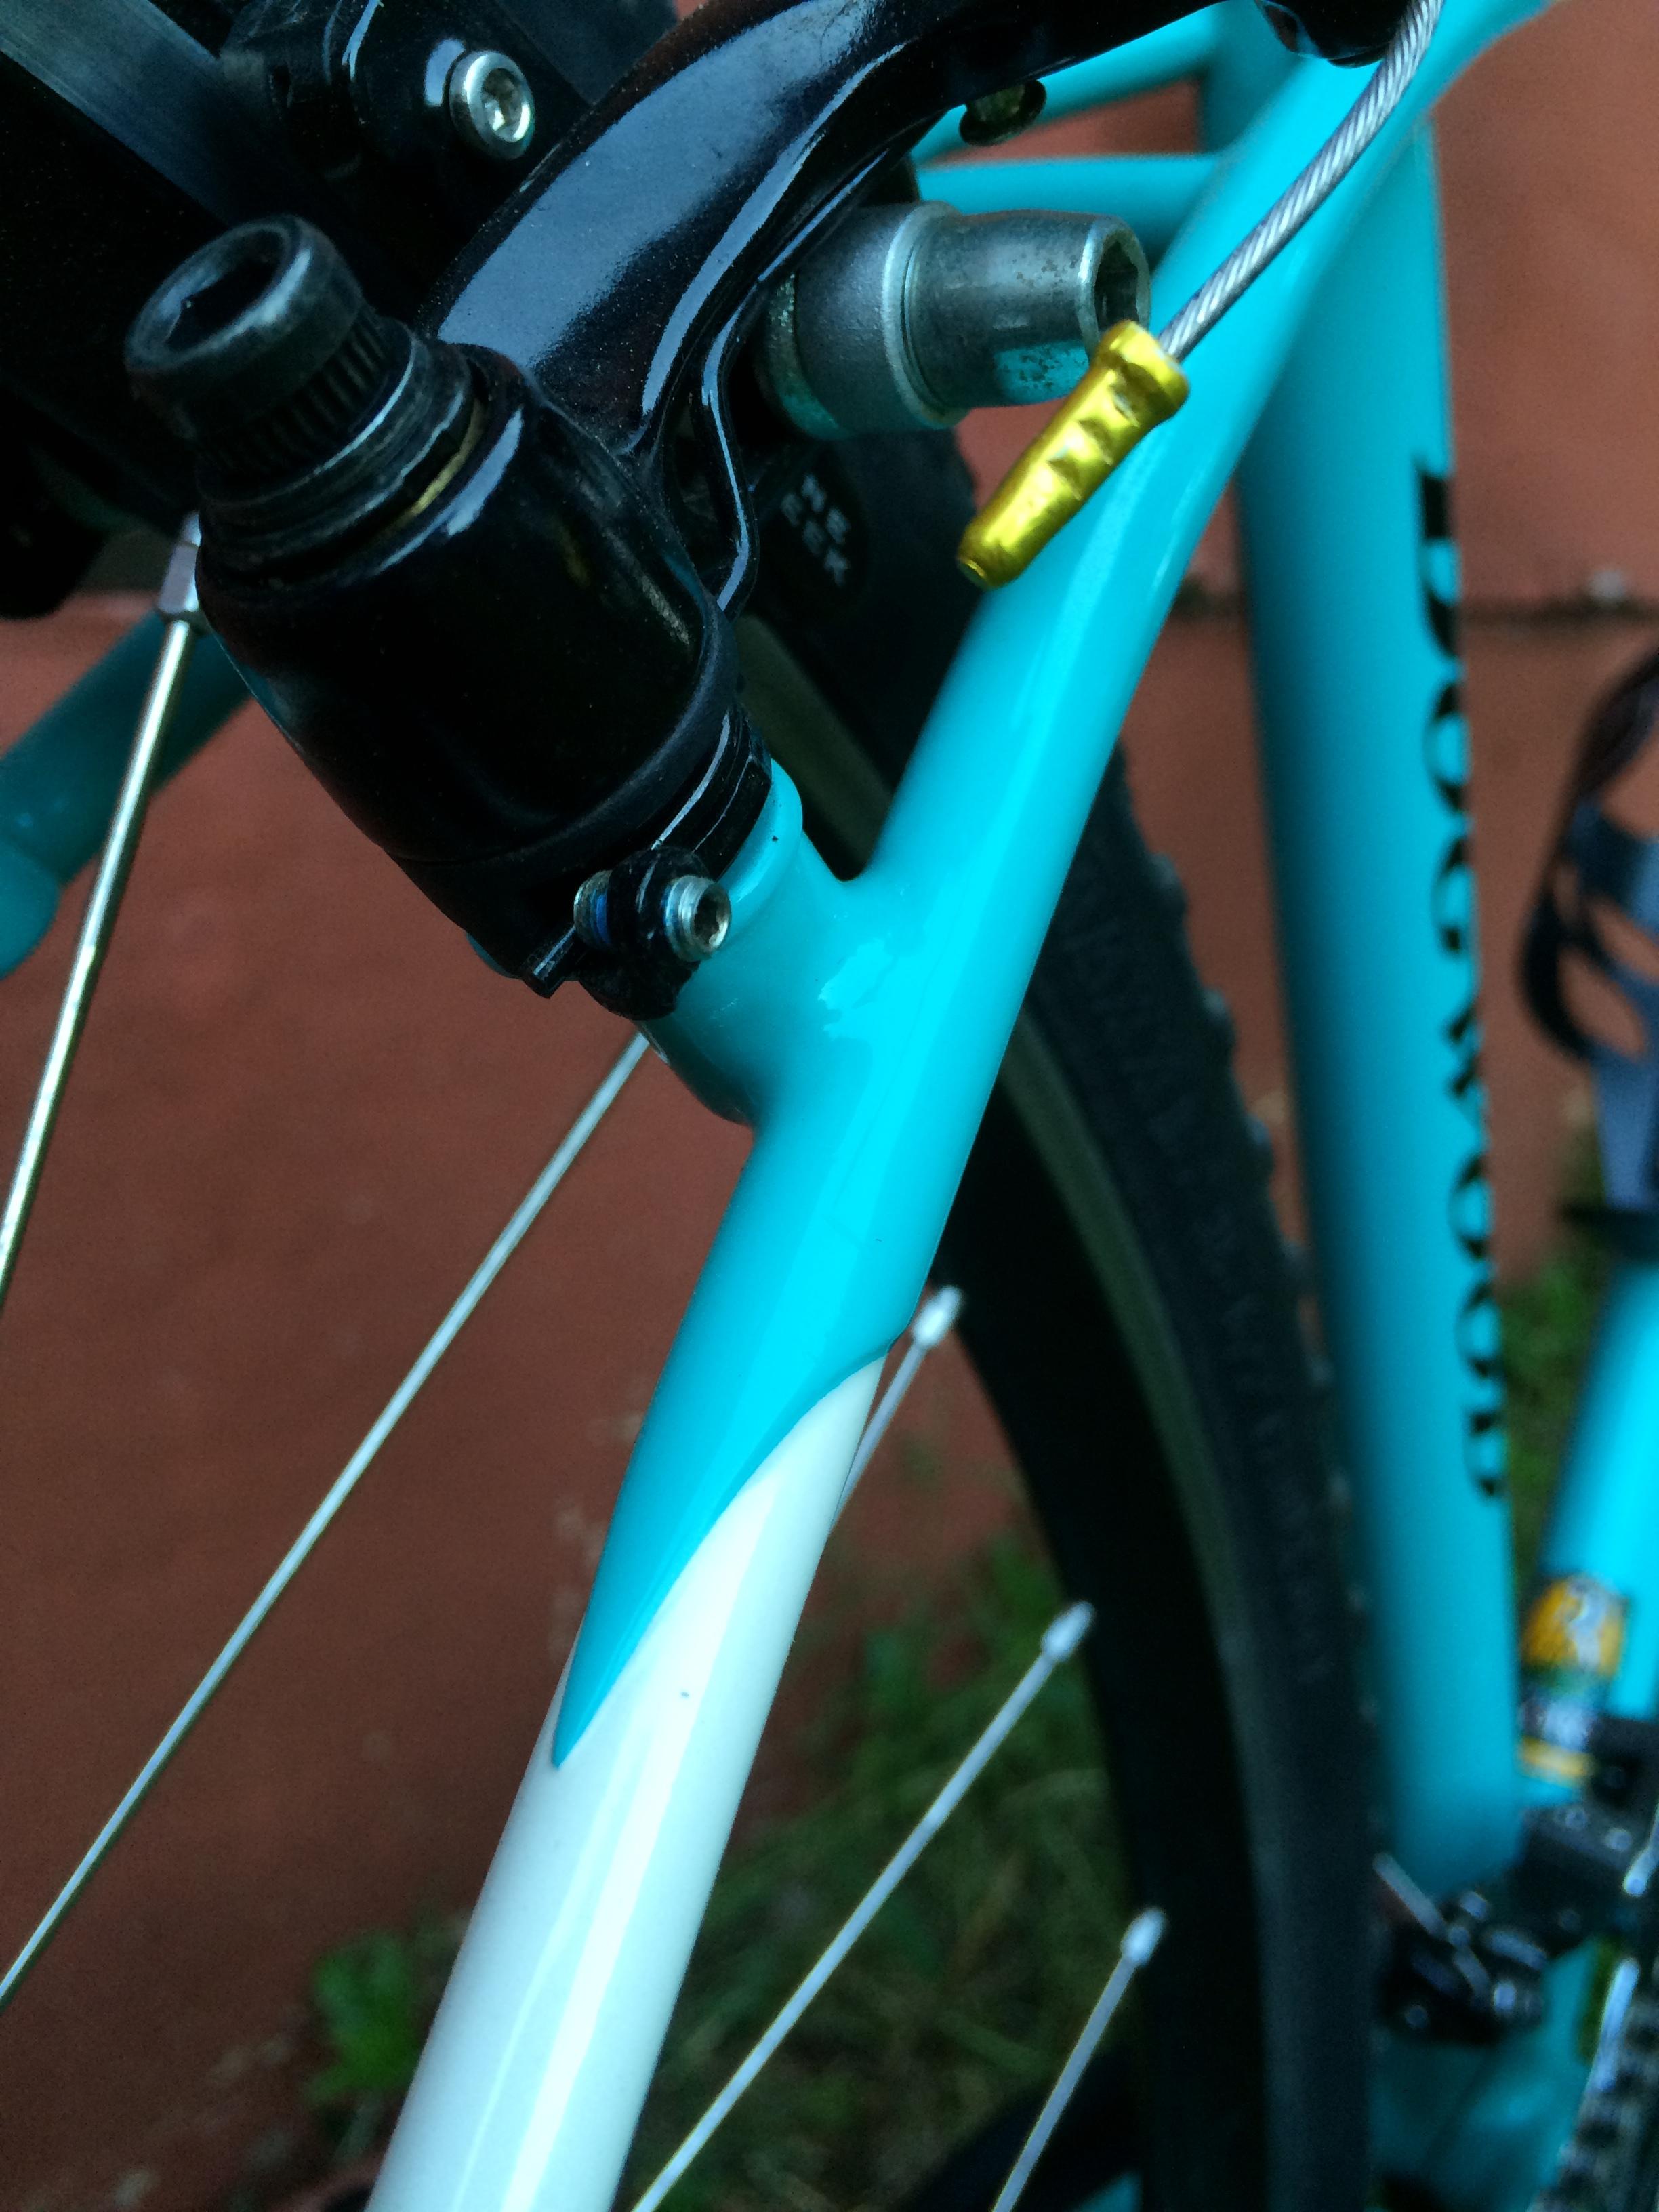 Dogwood-cycleworx-steel-custom-bicycle-columbus-tubing-cyclo-cross-8.jpg